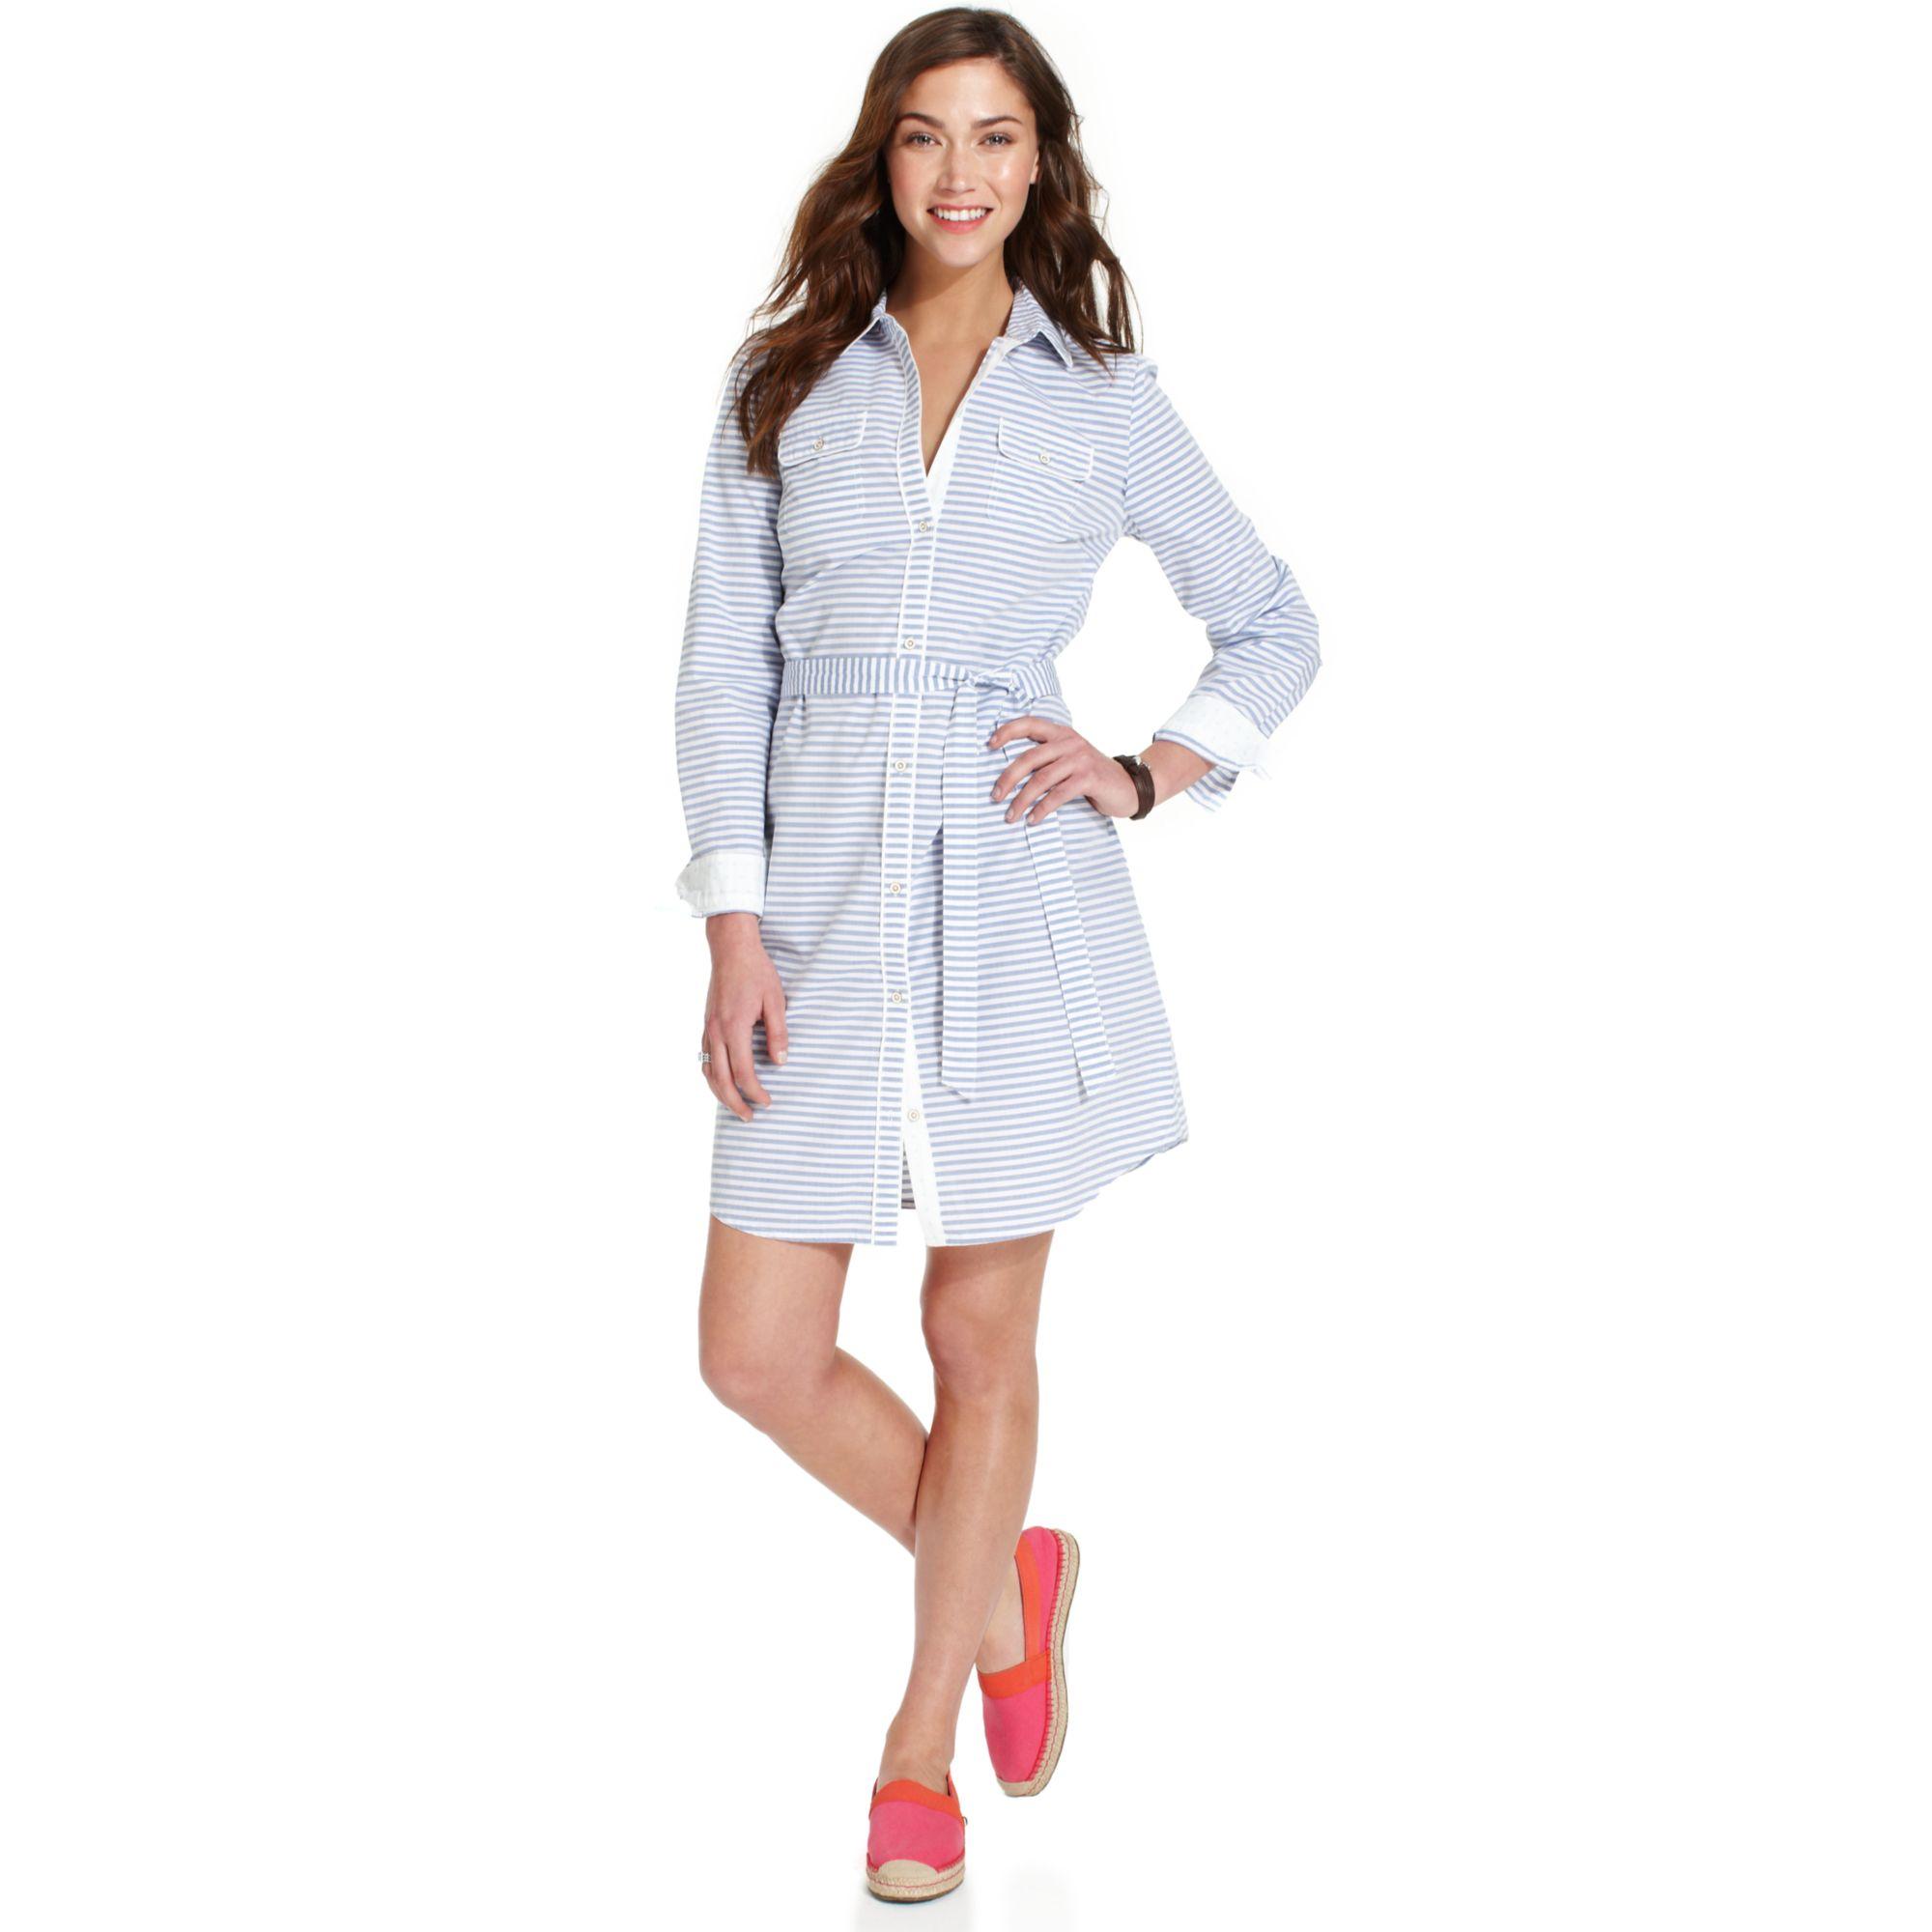 striped shirt dress - Blue Tommy Hilfiger Cheap Sale Purchase Get The Latest Fashion Big Sale Sale Online Discount Hot Sale jZchi